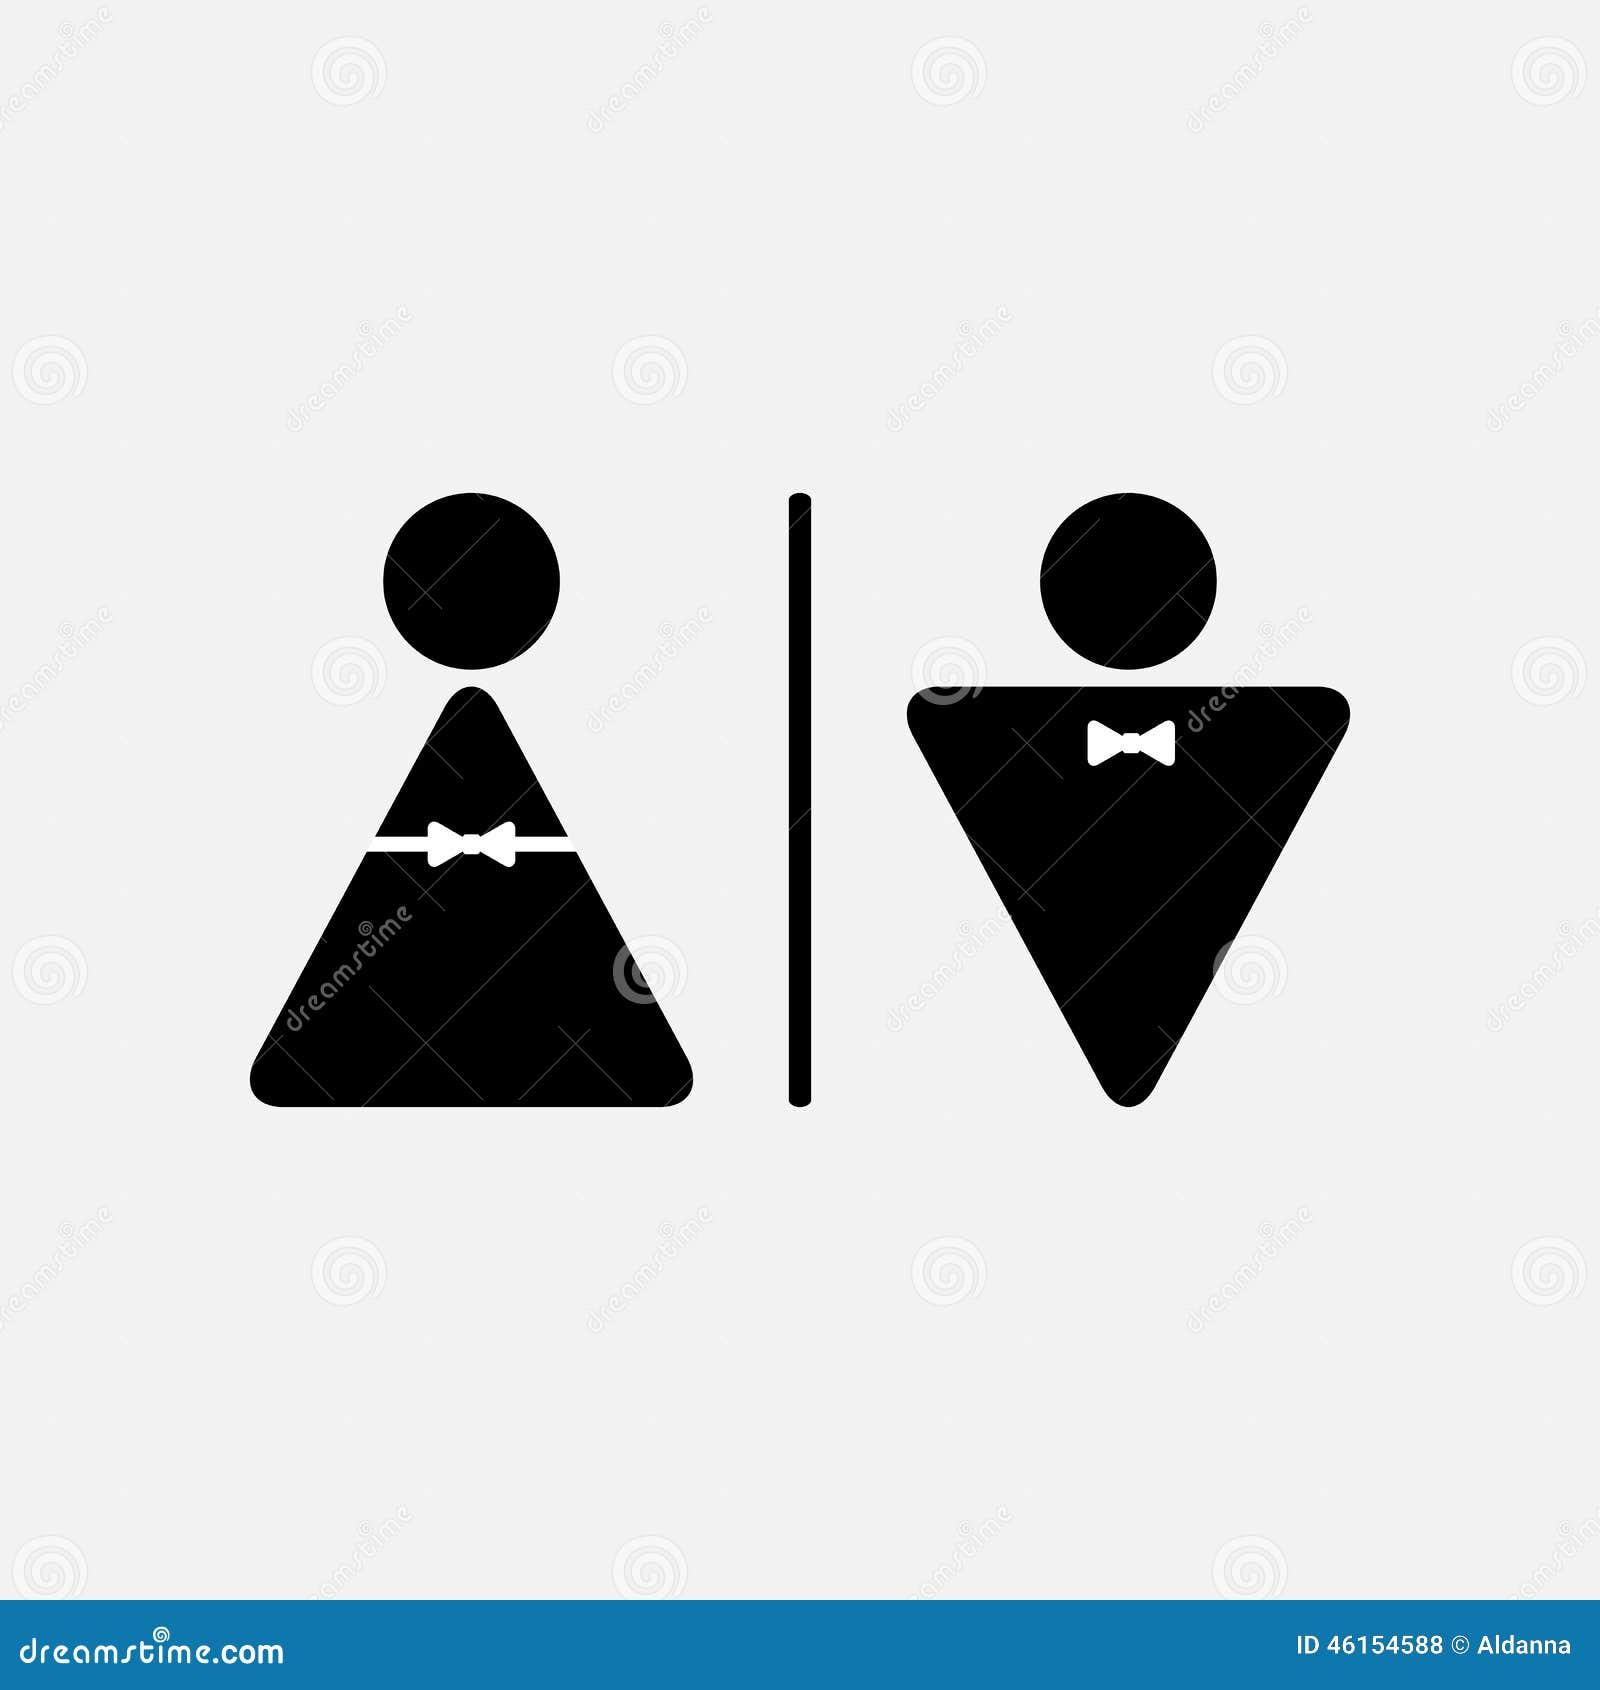 Toilet Signage Funny